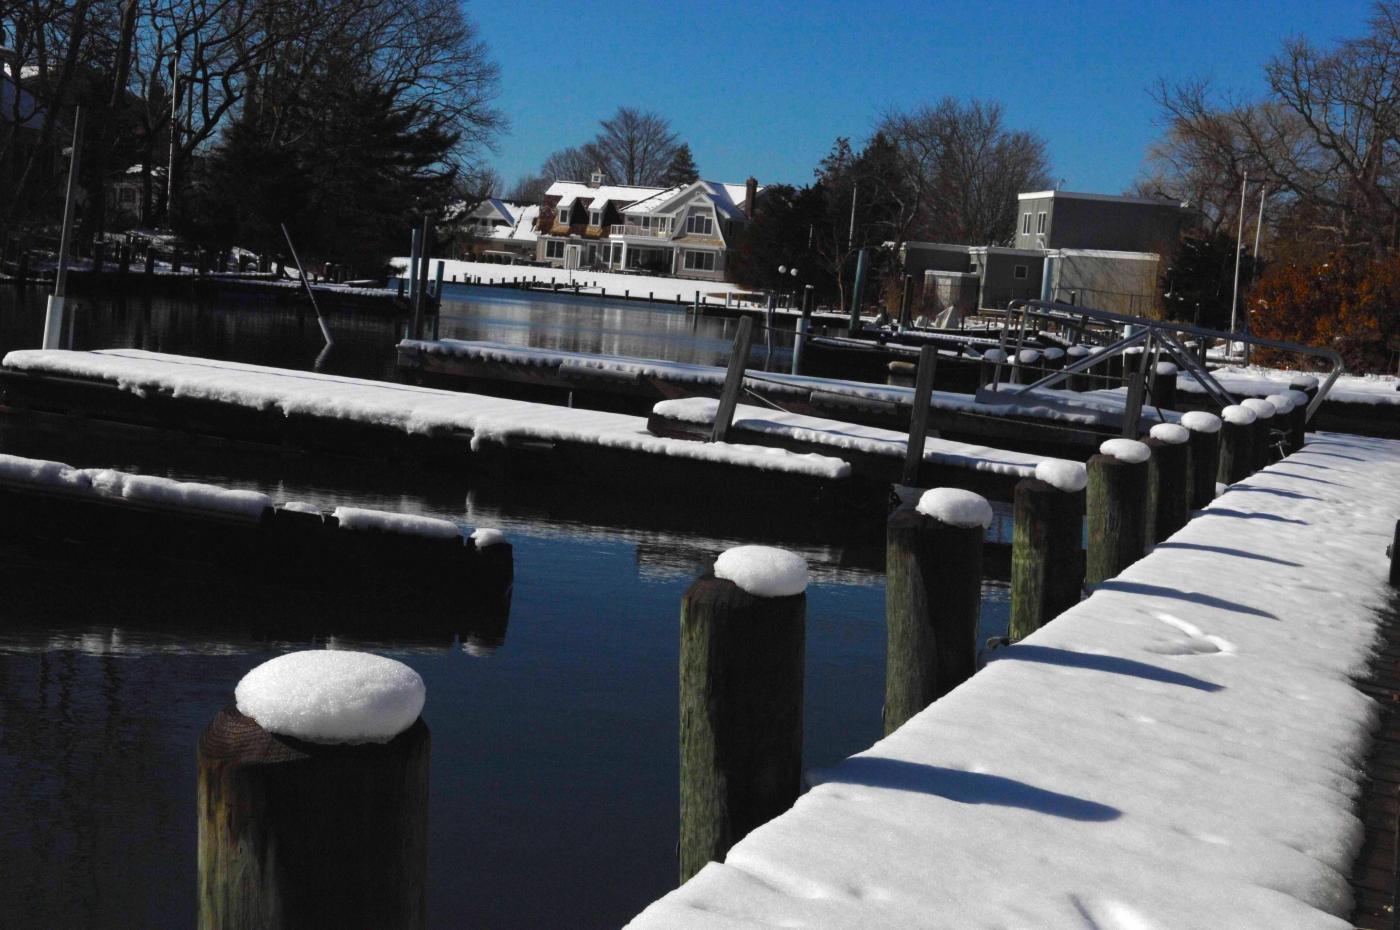 【圖博】春雪後的長島北福克North Fork_图1-13